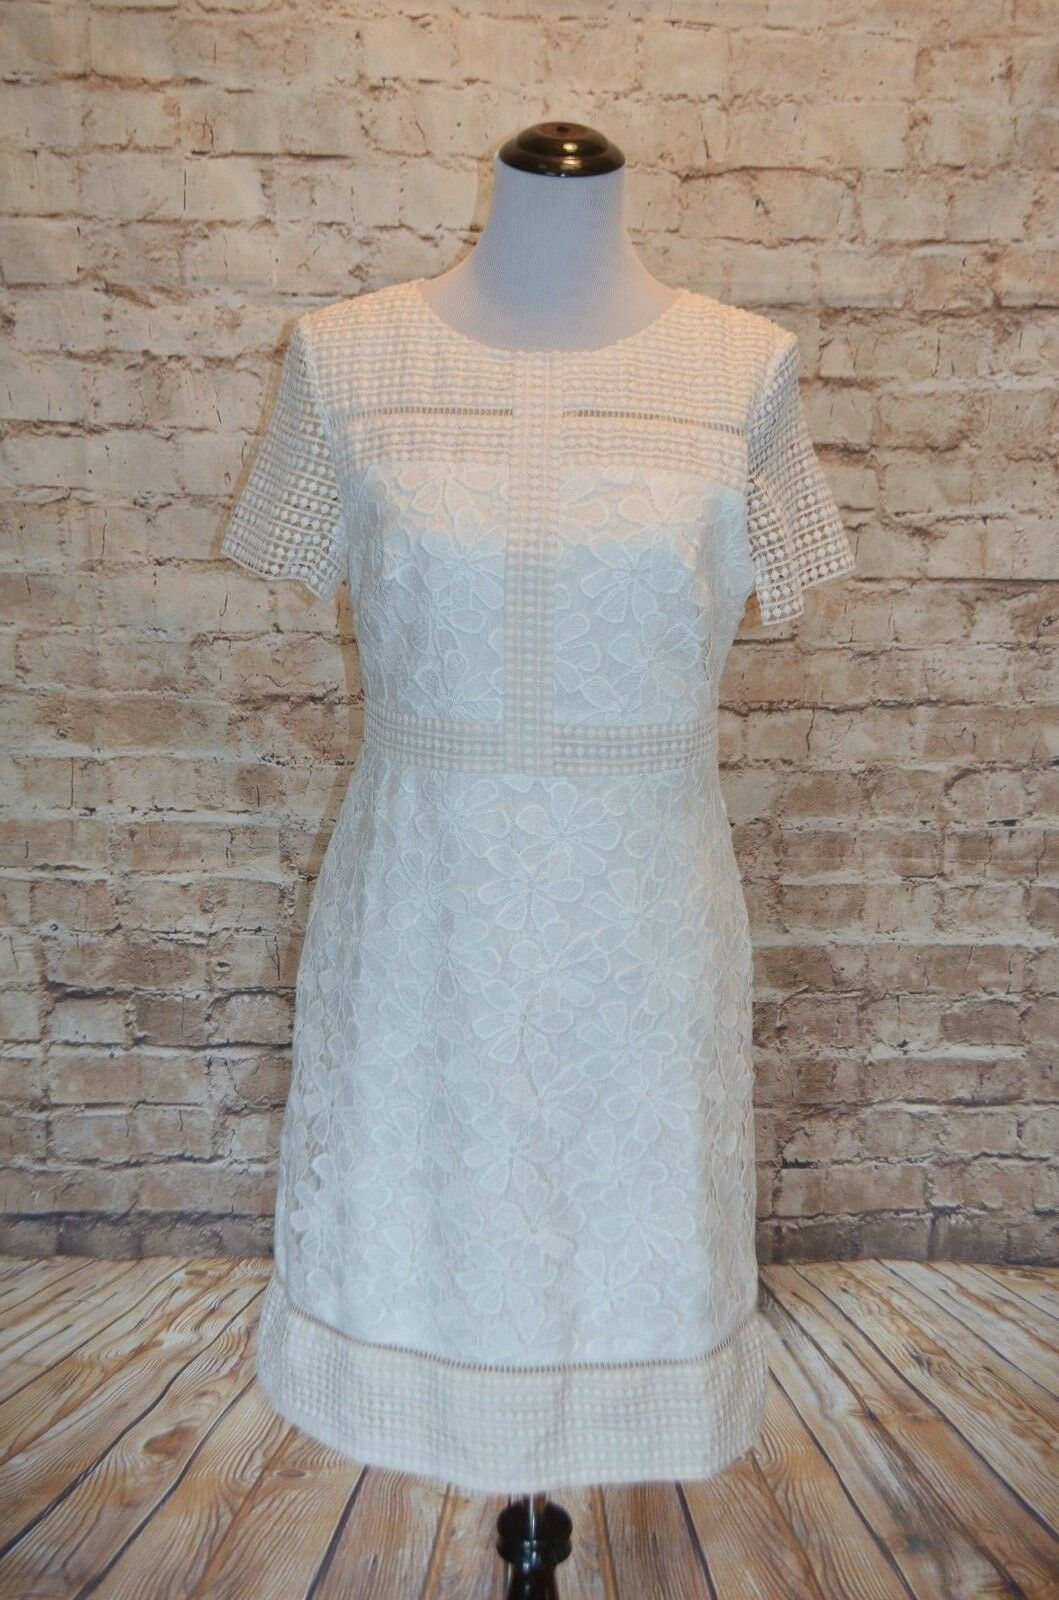 Modcloth Offbeat Brunch Dress crochet Ivory NWOT 10 women Ricco